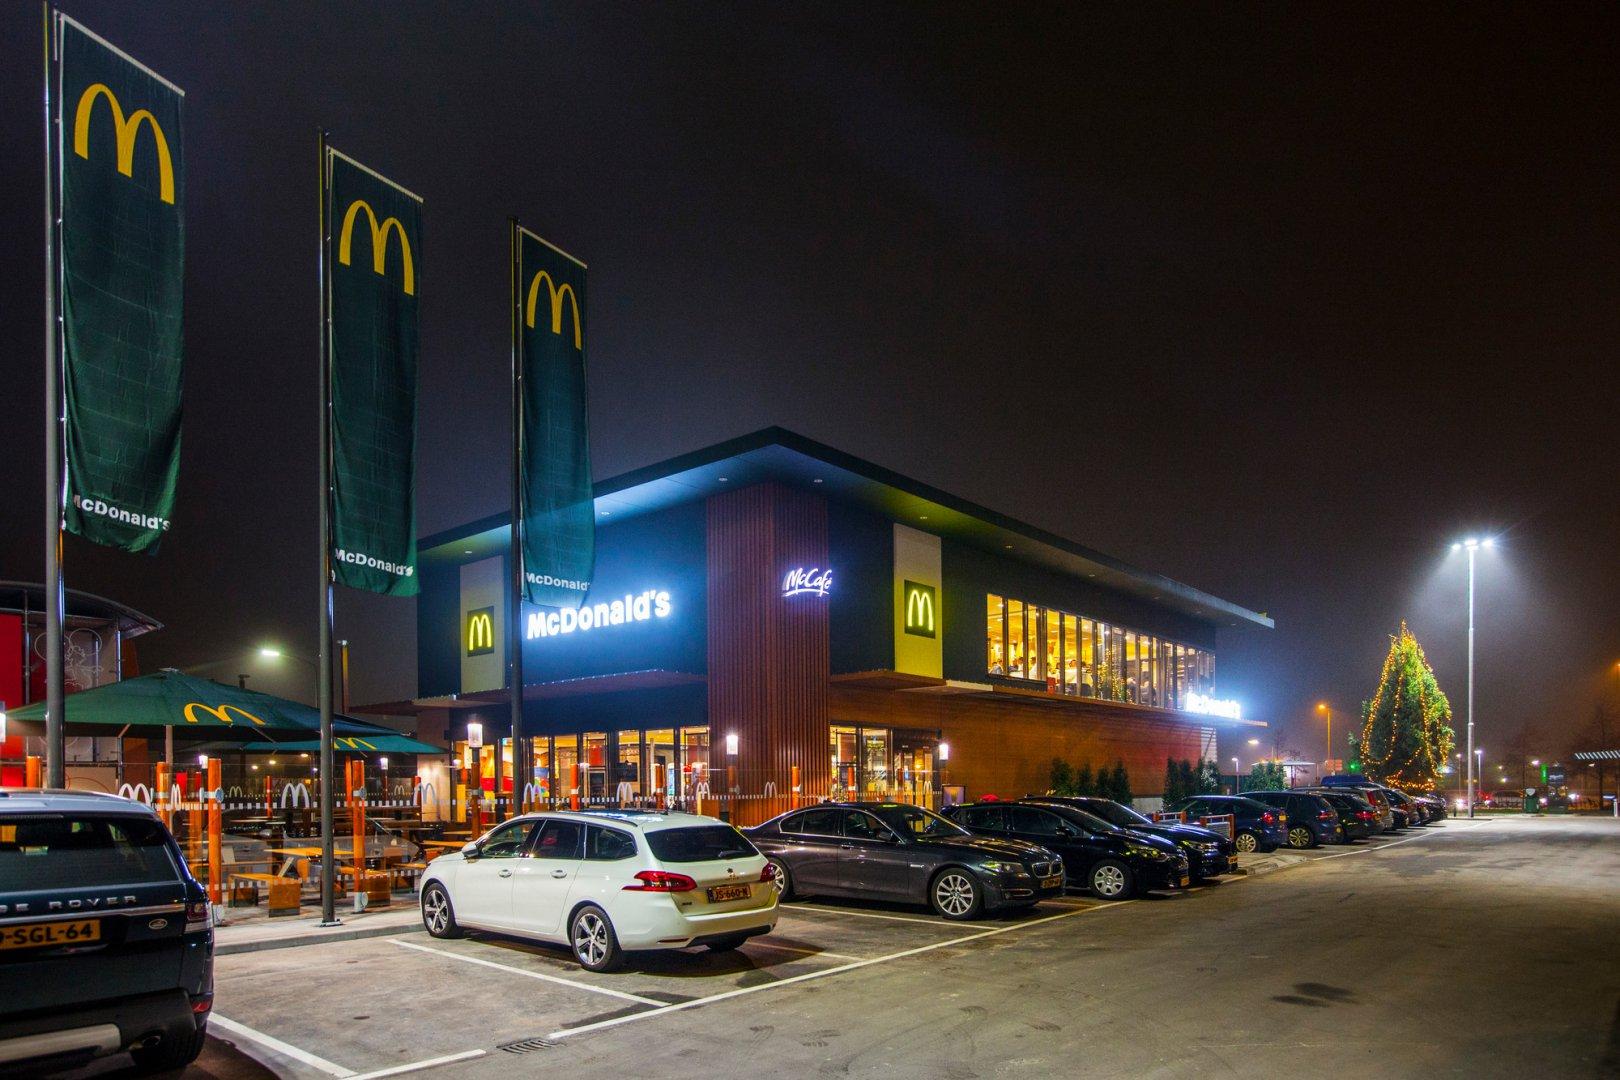 McDonald's Harderwijk